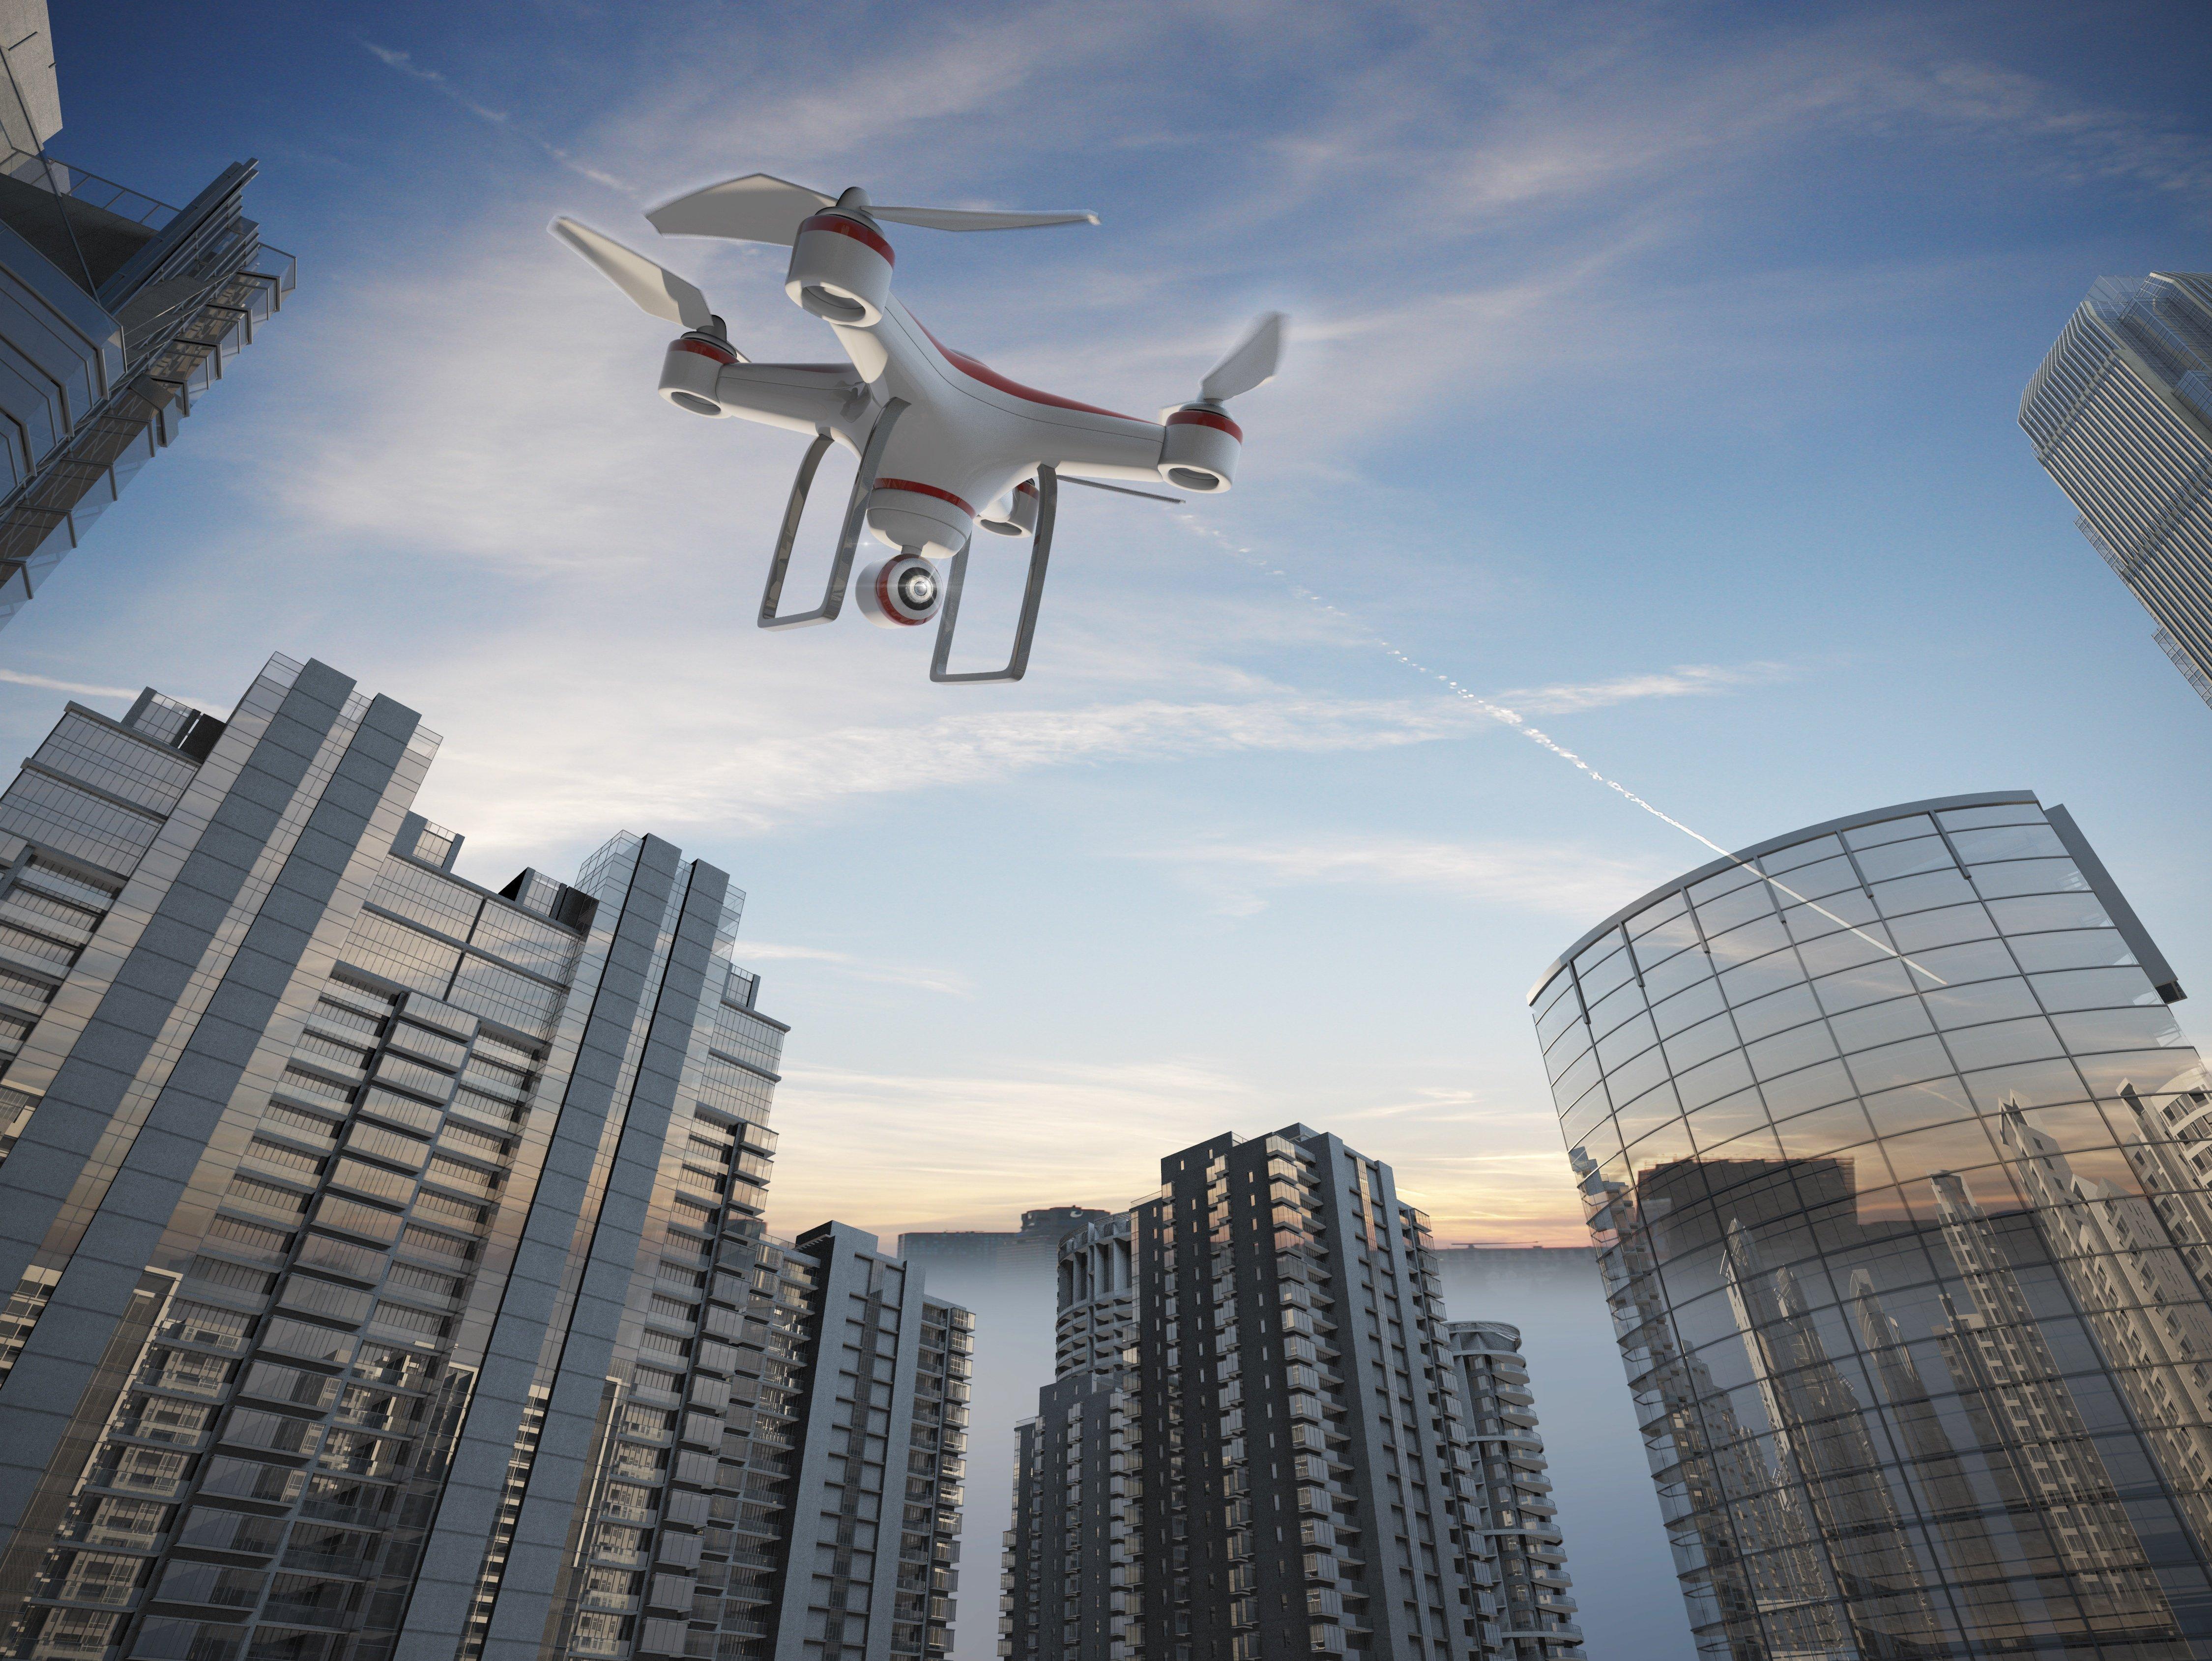 Drones_Urban Planning.jpg